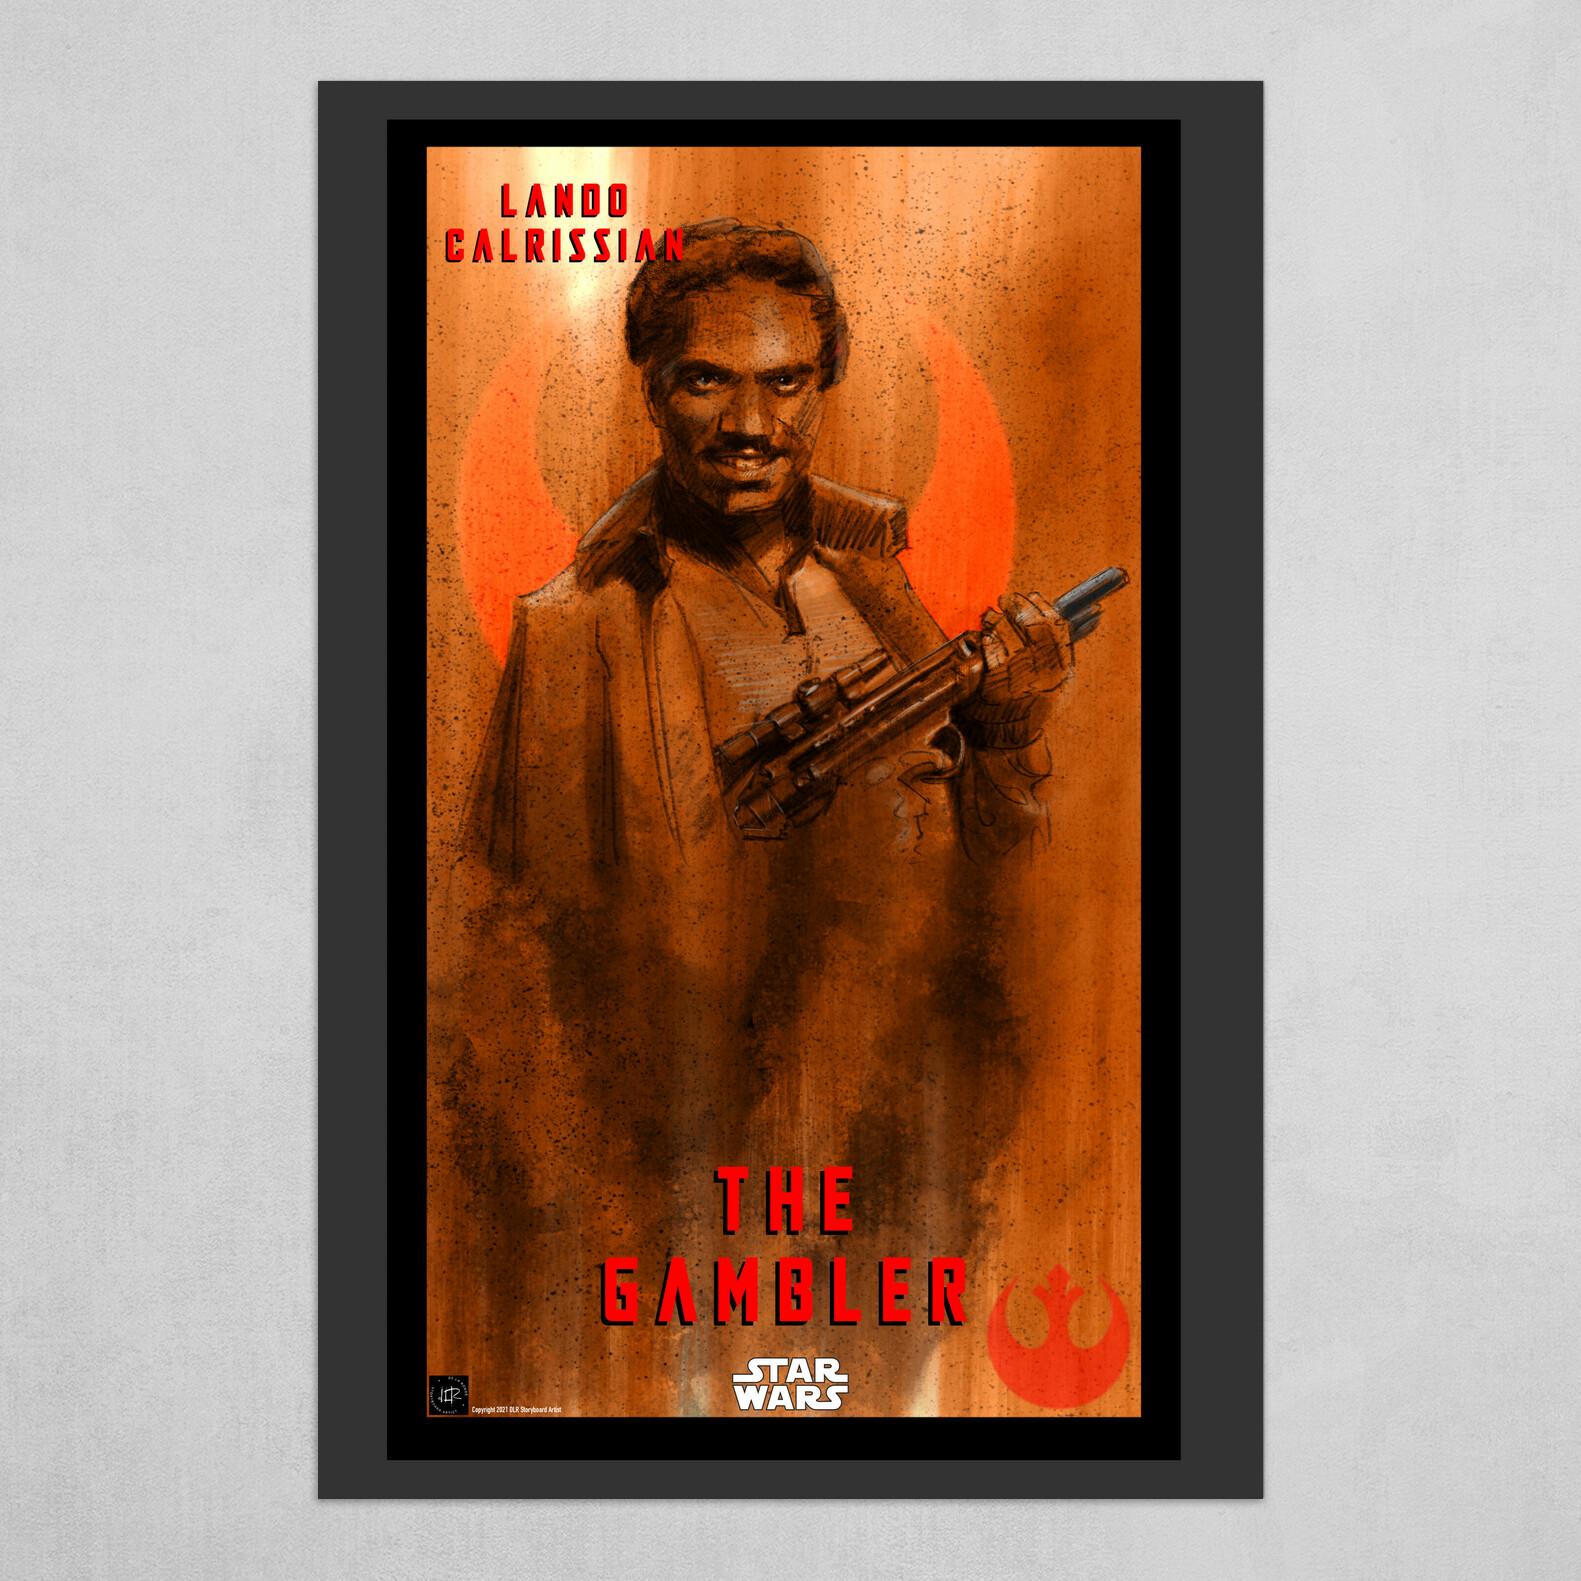 Lando Calrissian Poster -The Gambler